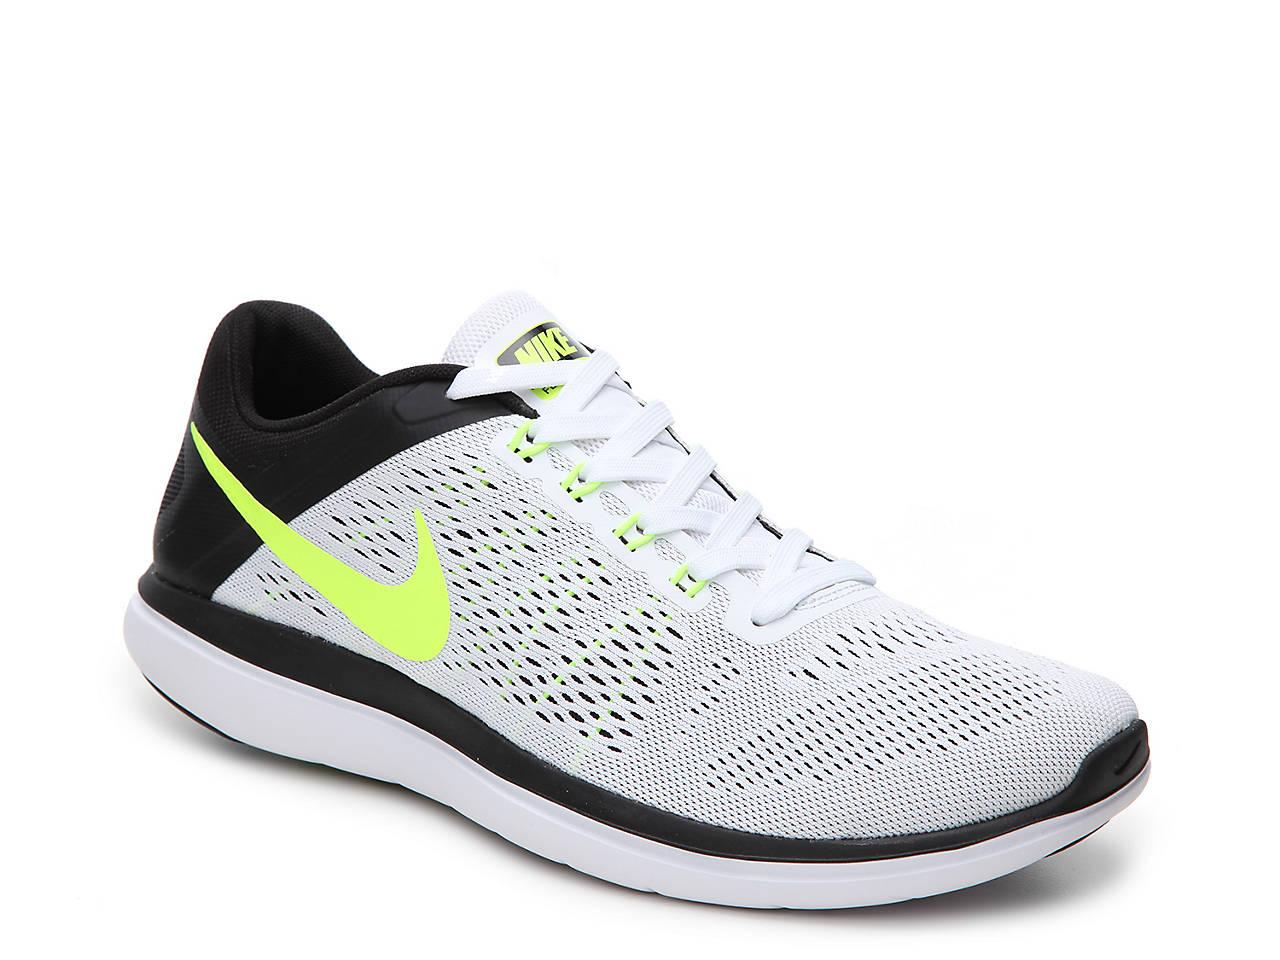 699e271dc8aee Nike Flex 2016 RN Lightweight Running Shoe - Men s Men s Shoes